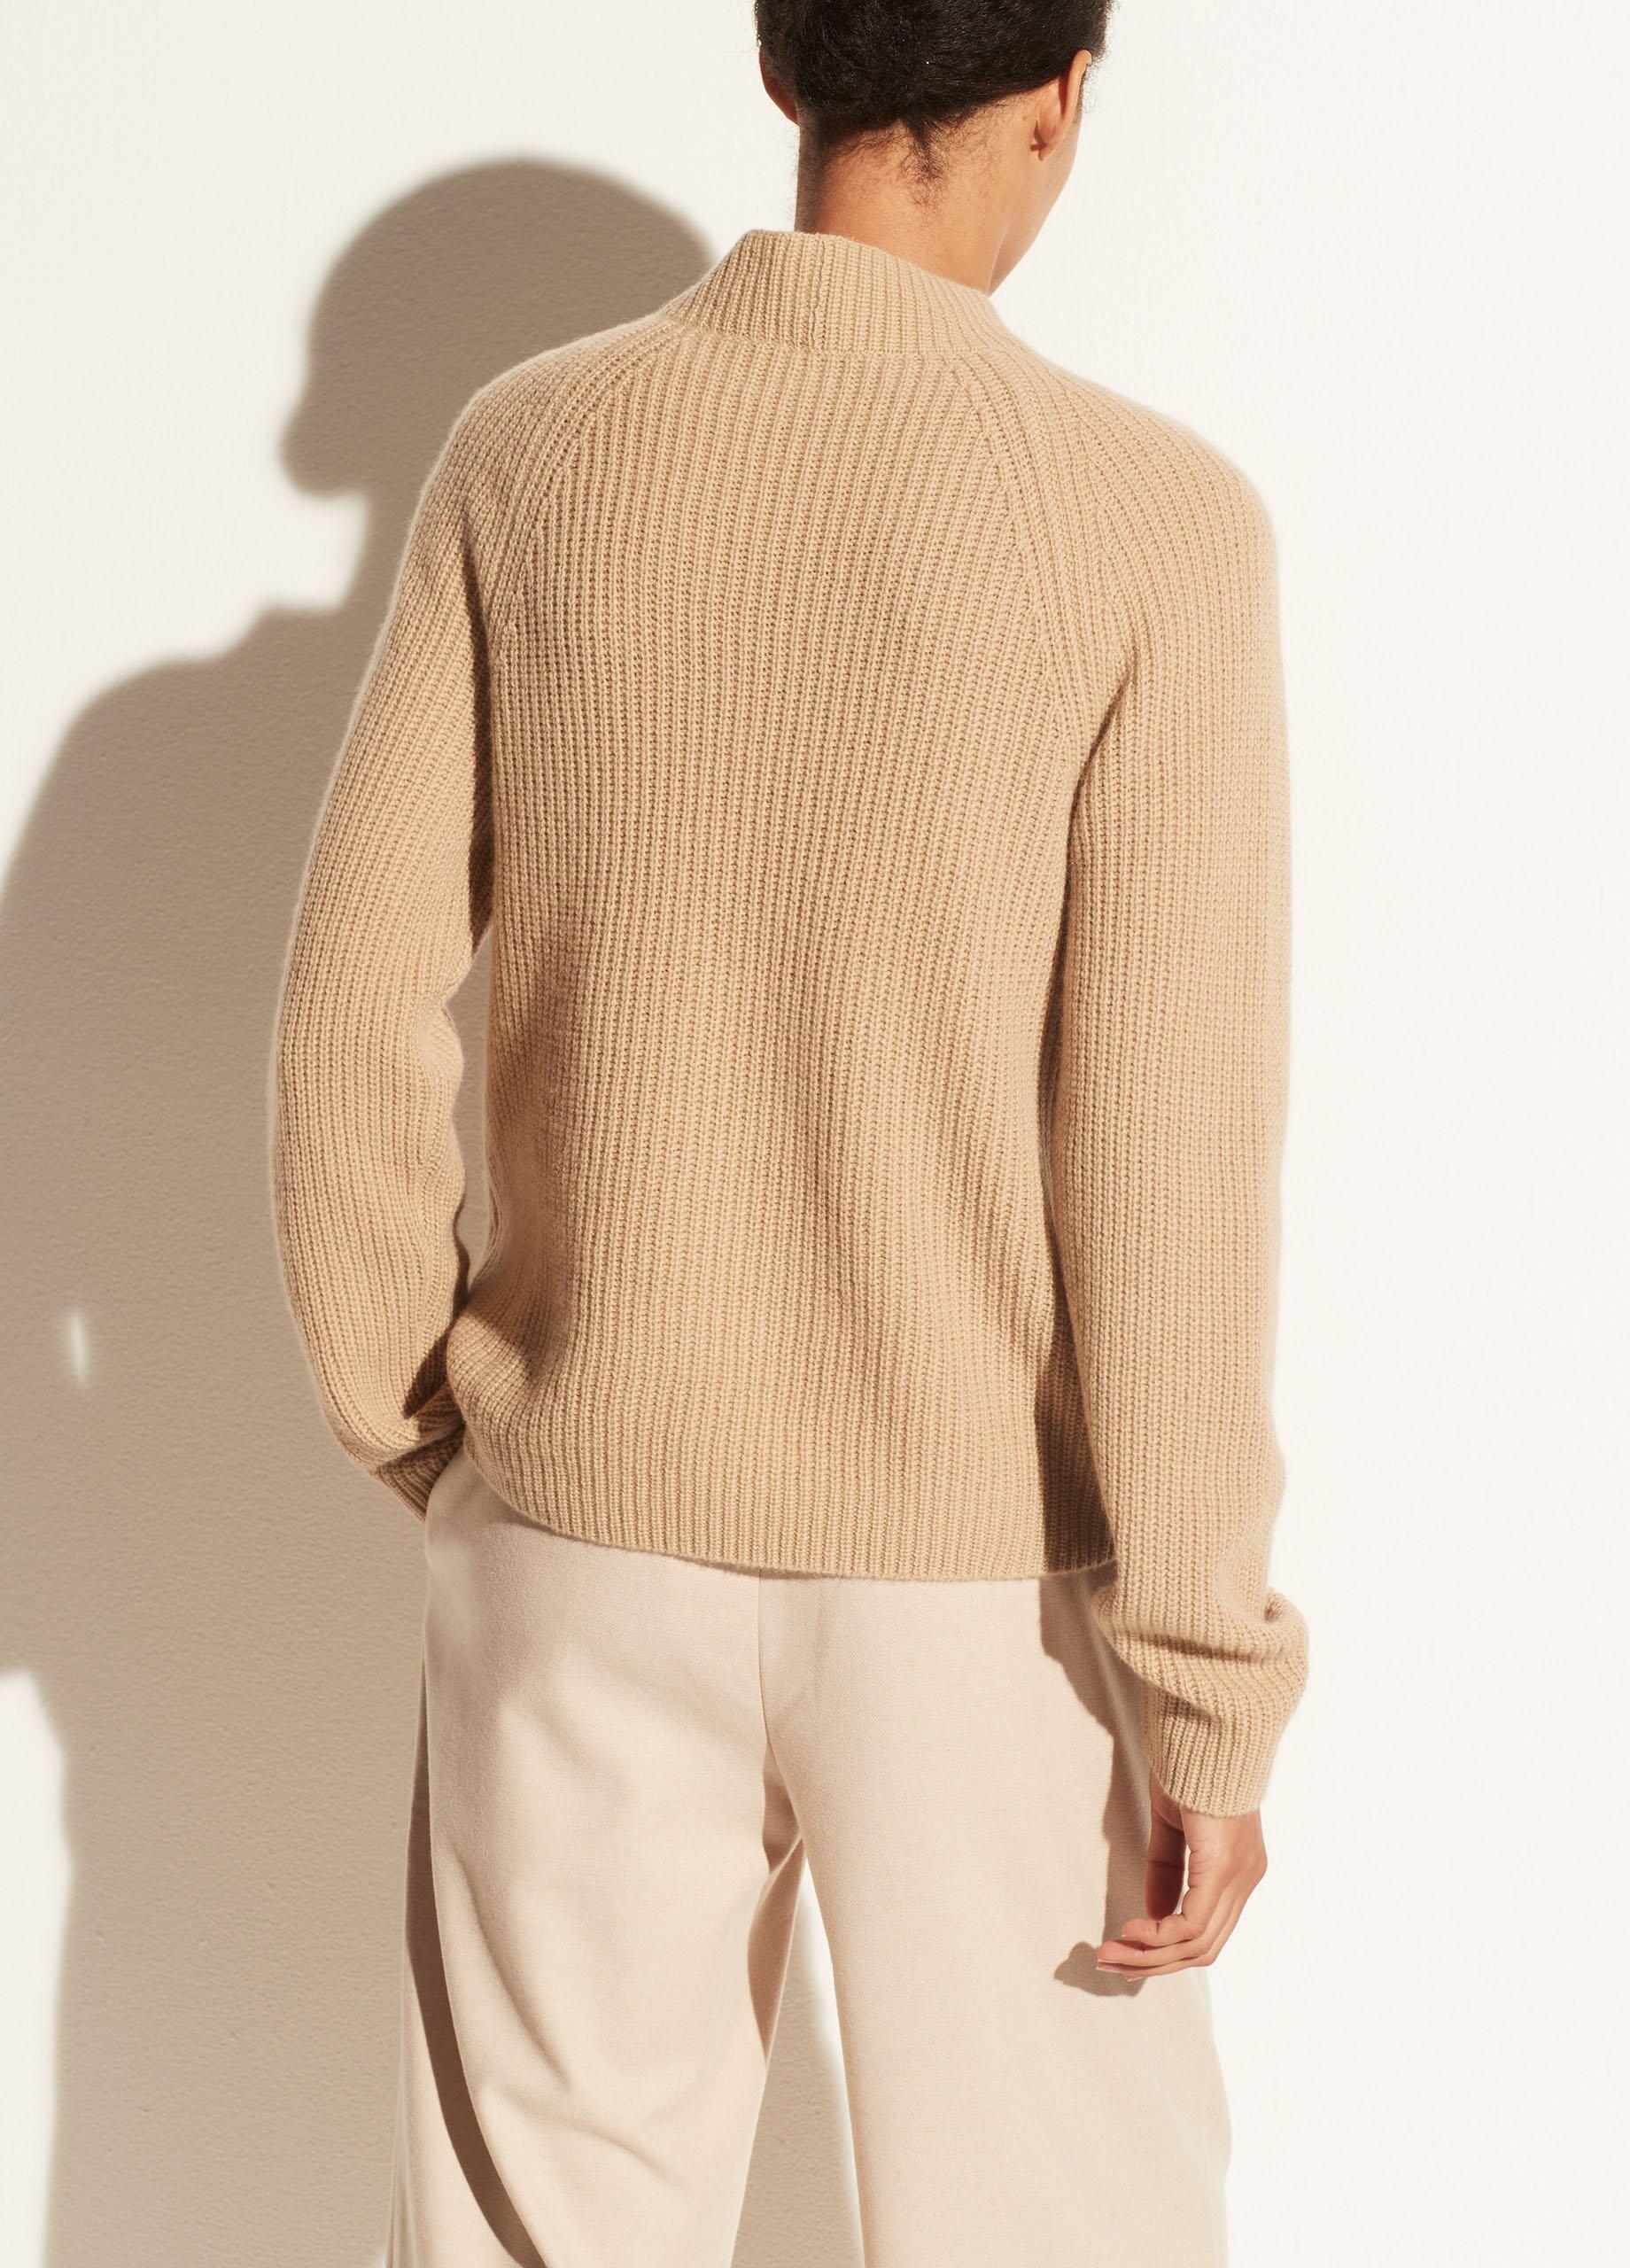 Cashmere Mock Neck Shaker Rib Pullover